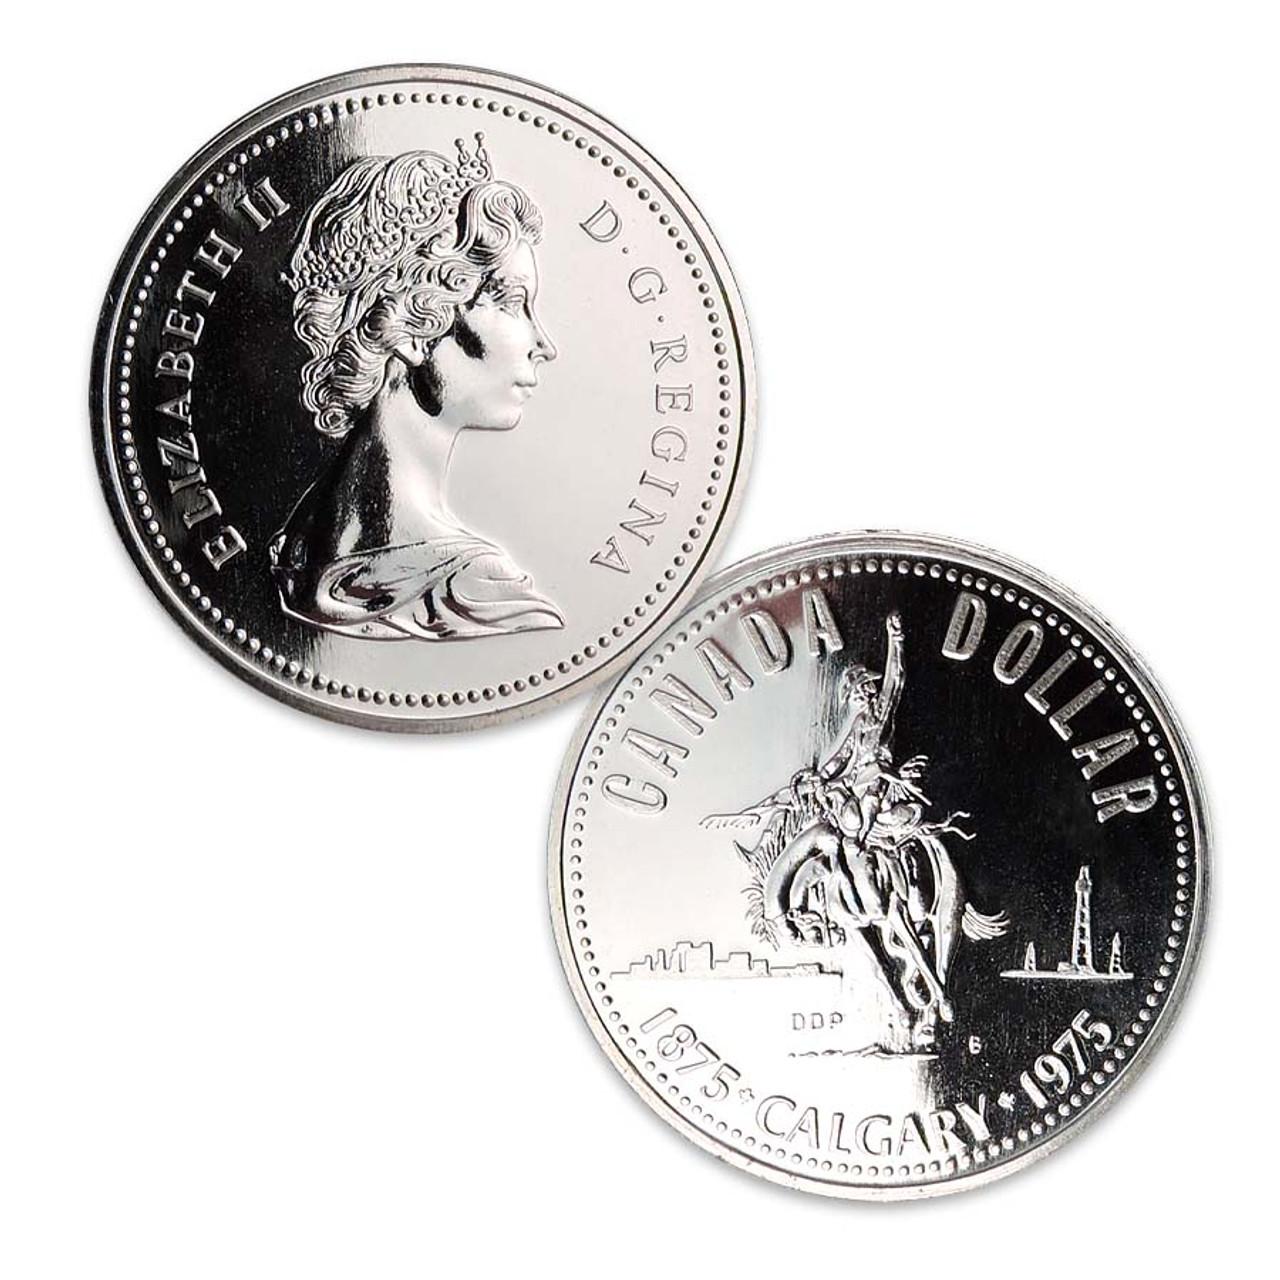 Canada 1975 Calgary Dollar Image 1